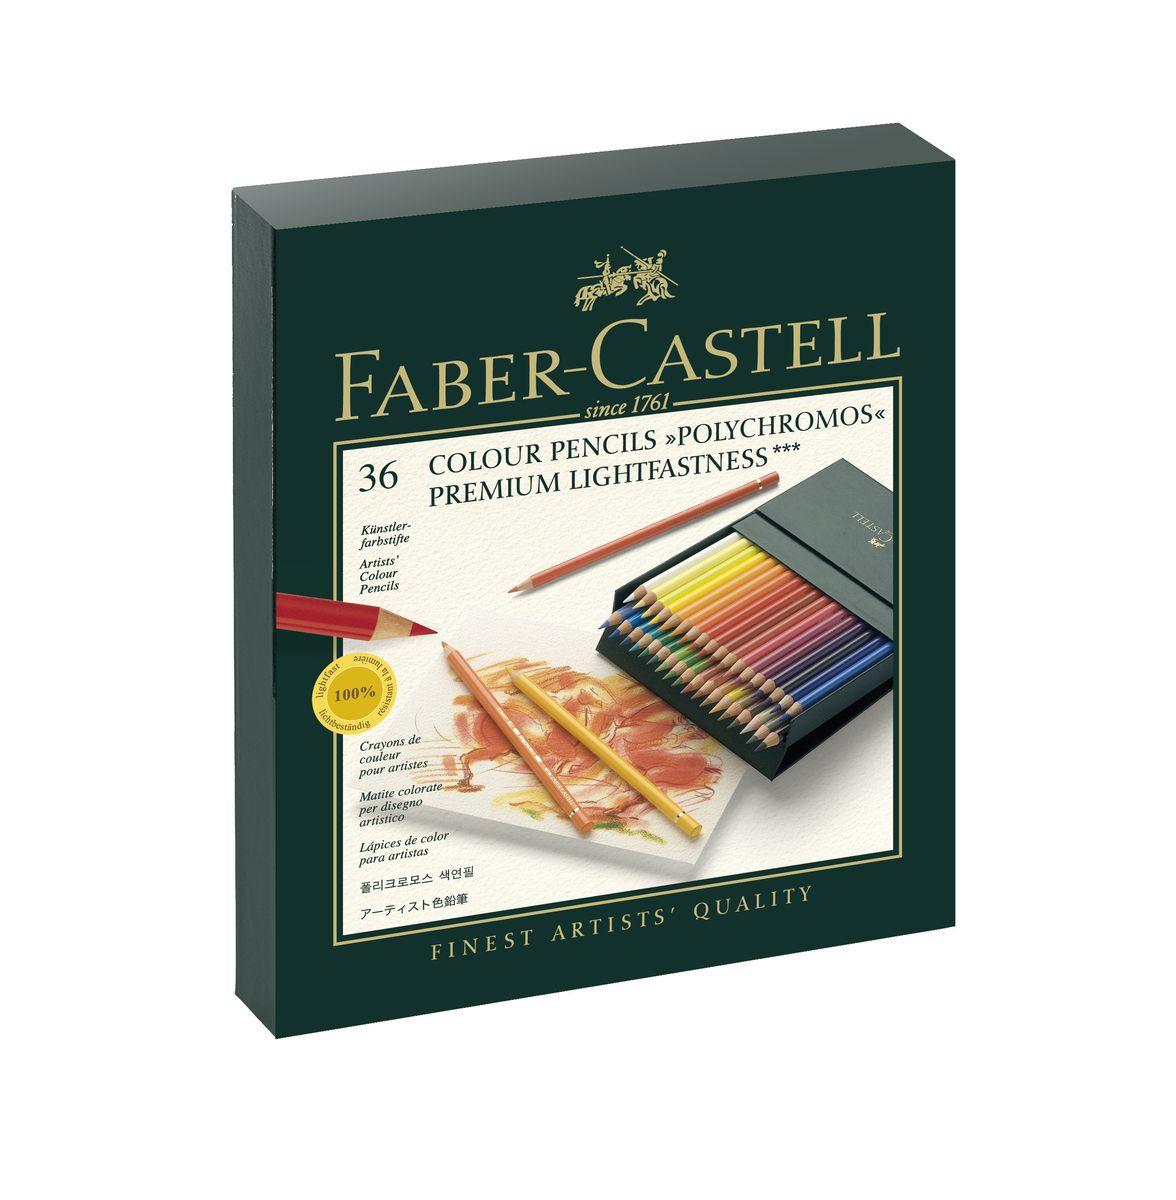 Цветные карандаши Faber-Castell Polychromos 36 цветов #1